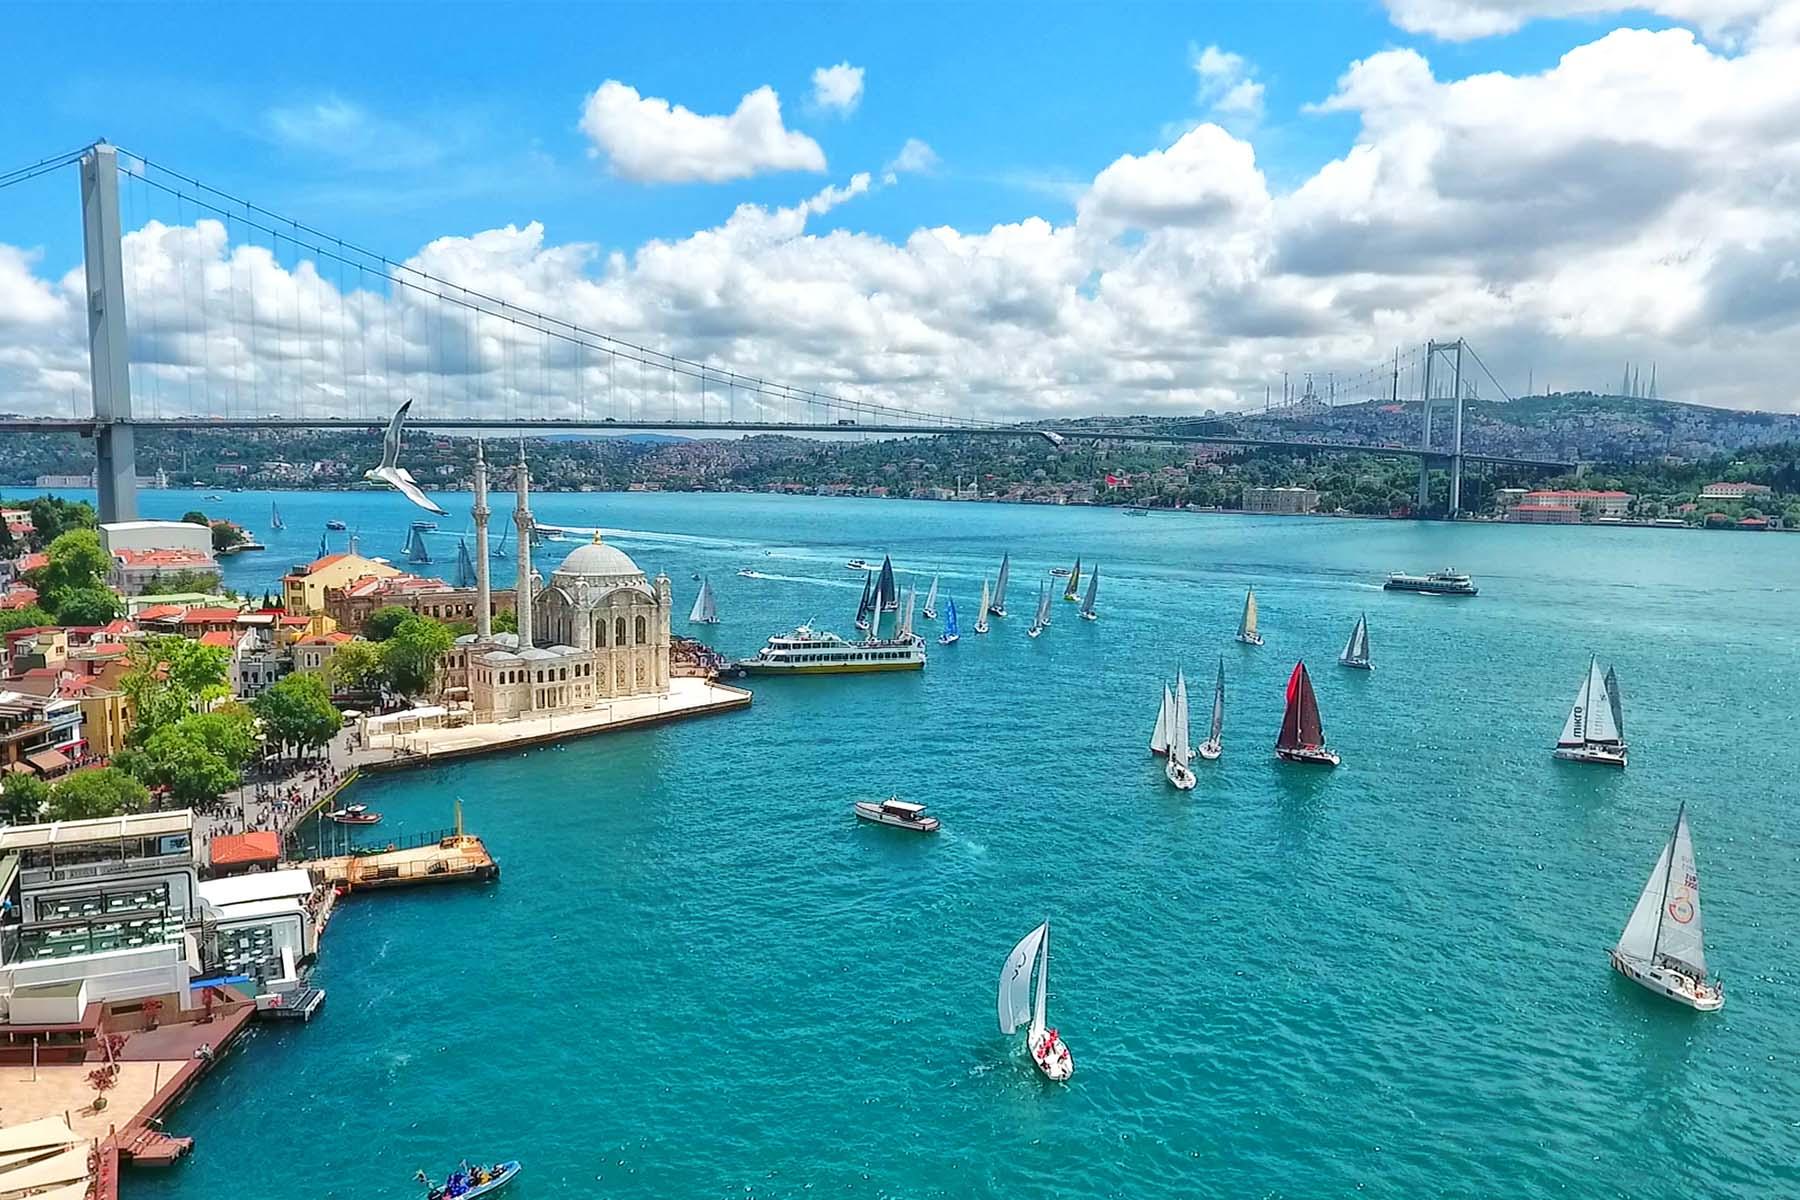 تور آنتالیا + استانبول